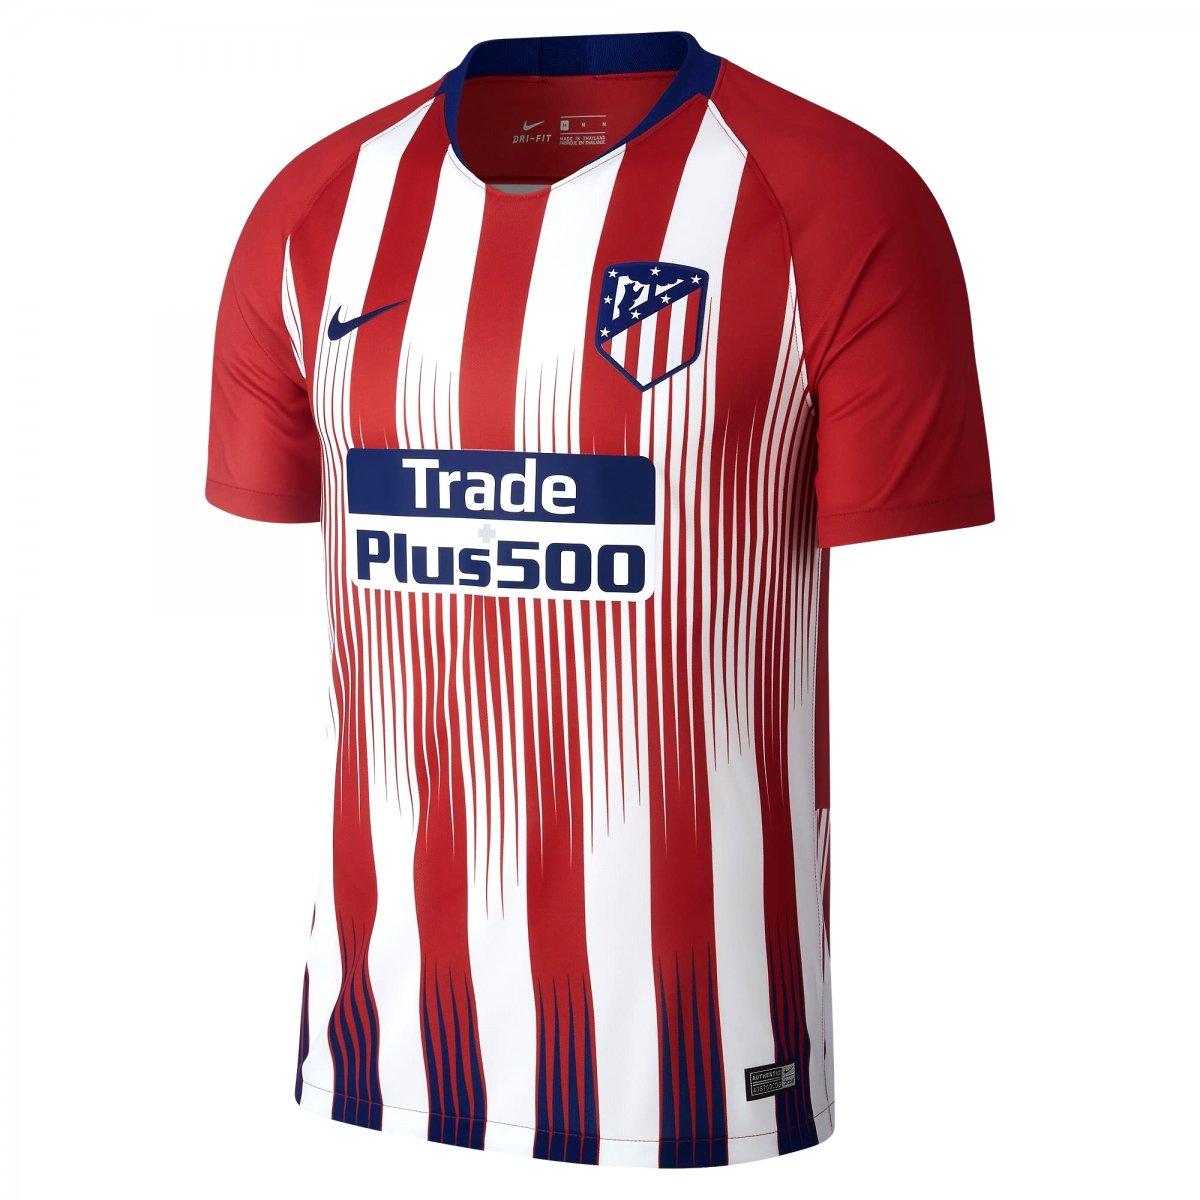 Amplie a imagem. Camisa Masculina Nike Atletico de Madrid 2018 19  Camisa  Masculina Nike Atletico ... a10b793740c1d